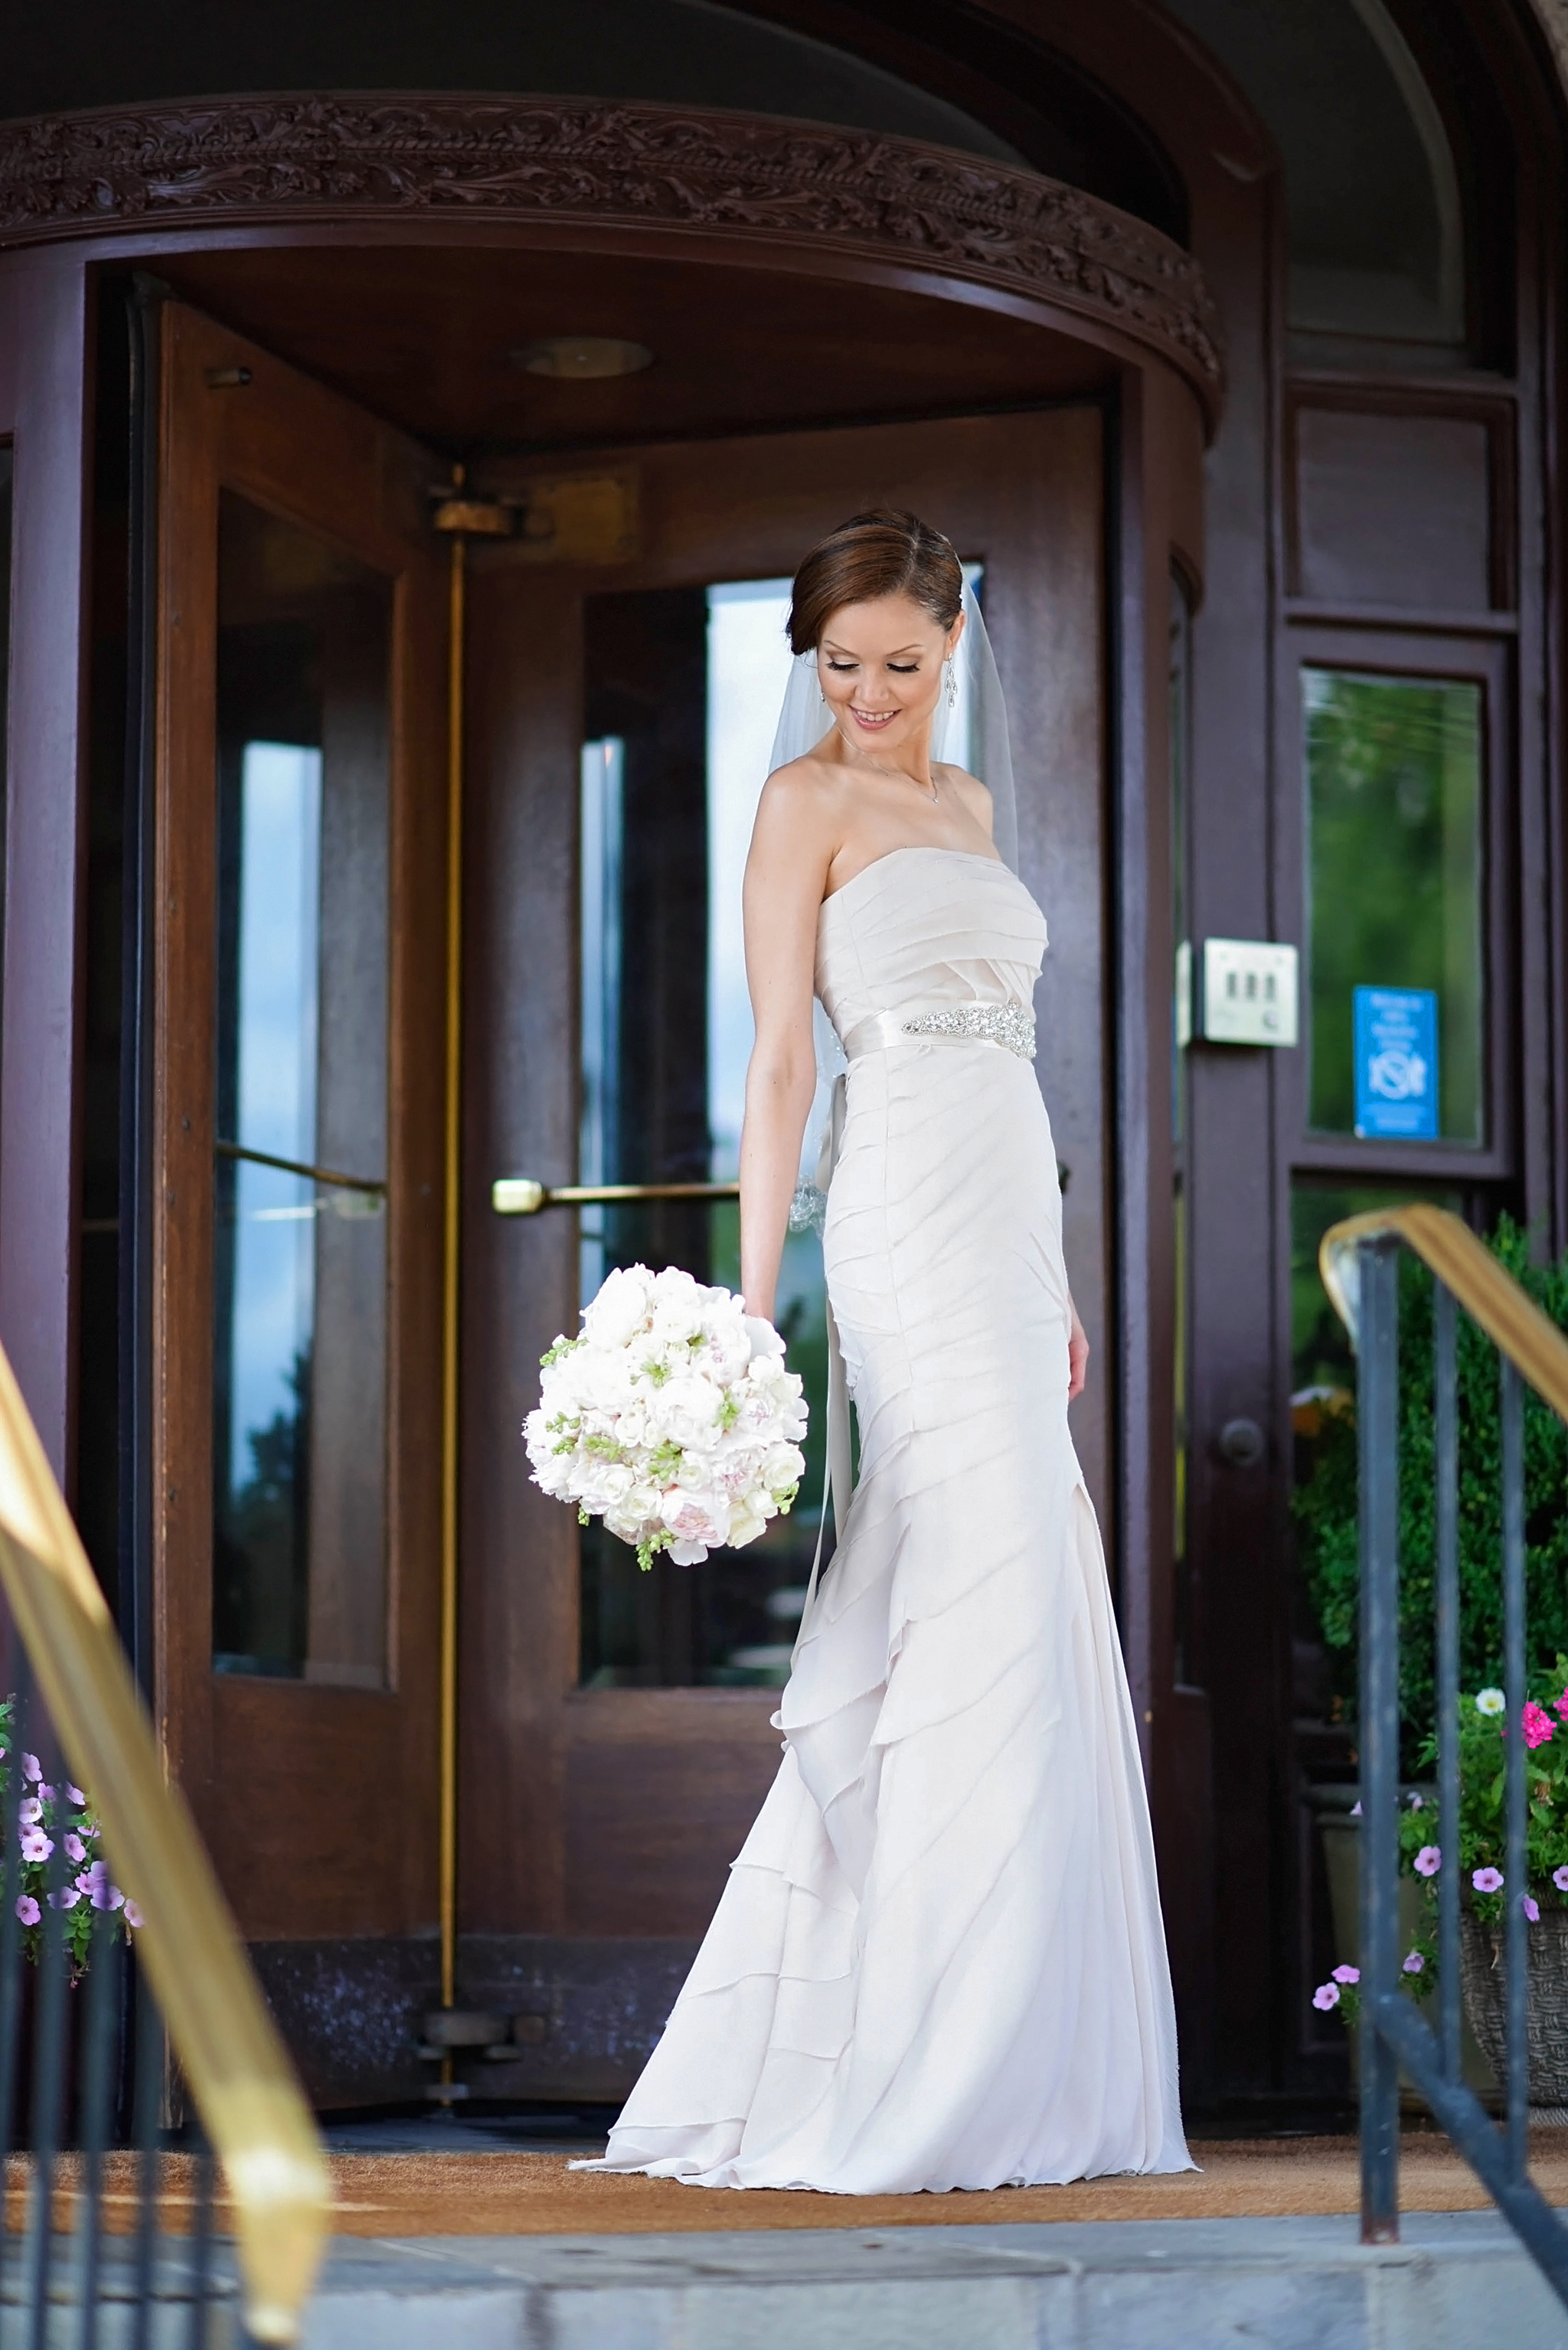 NJ-NY-wedding-photographer-005NJ-NY-wedding-photographer-005NJ-NY-WEDDING-PHOTOGRAPHER-005.JPG